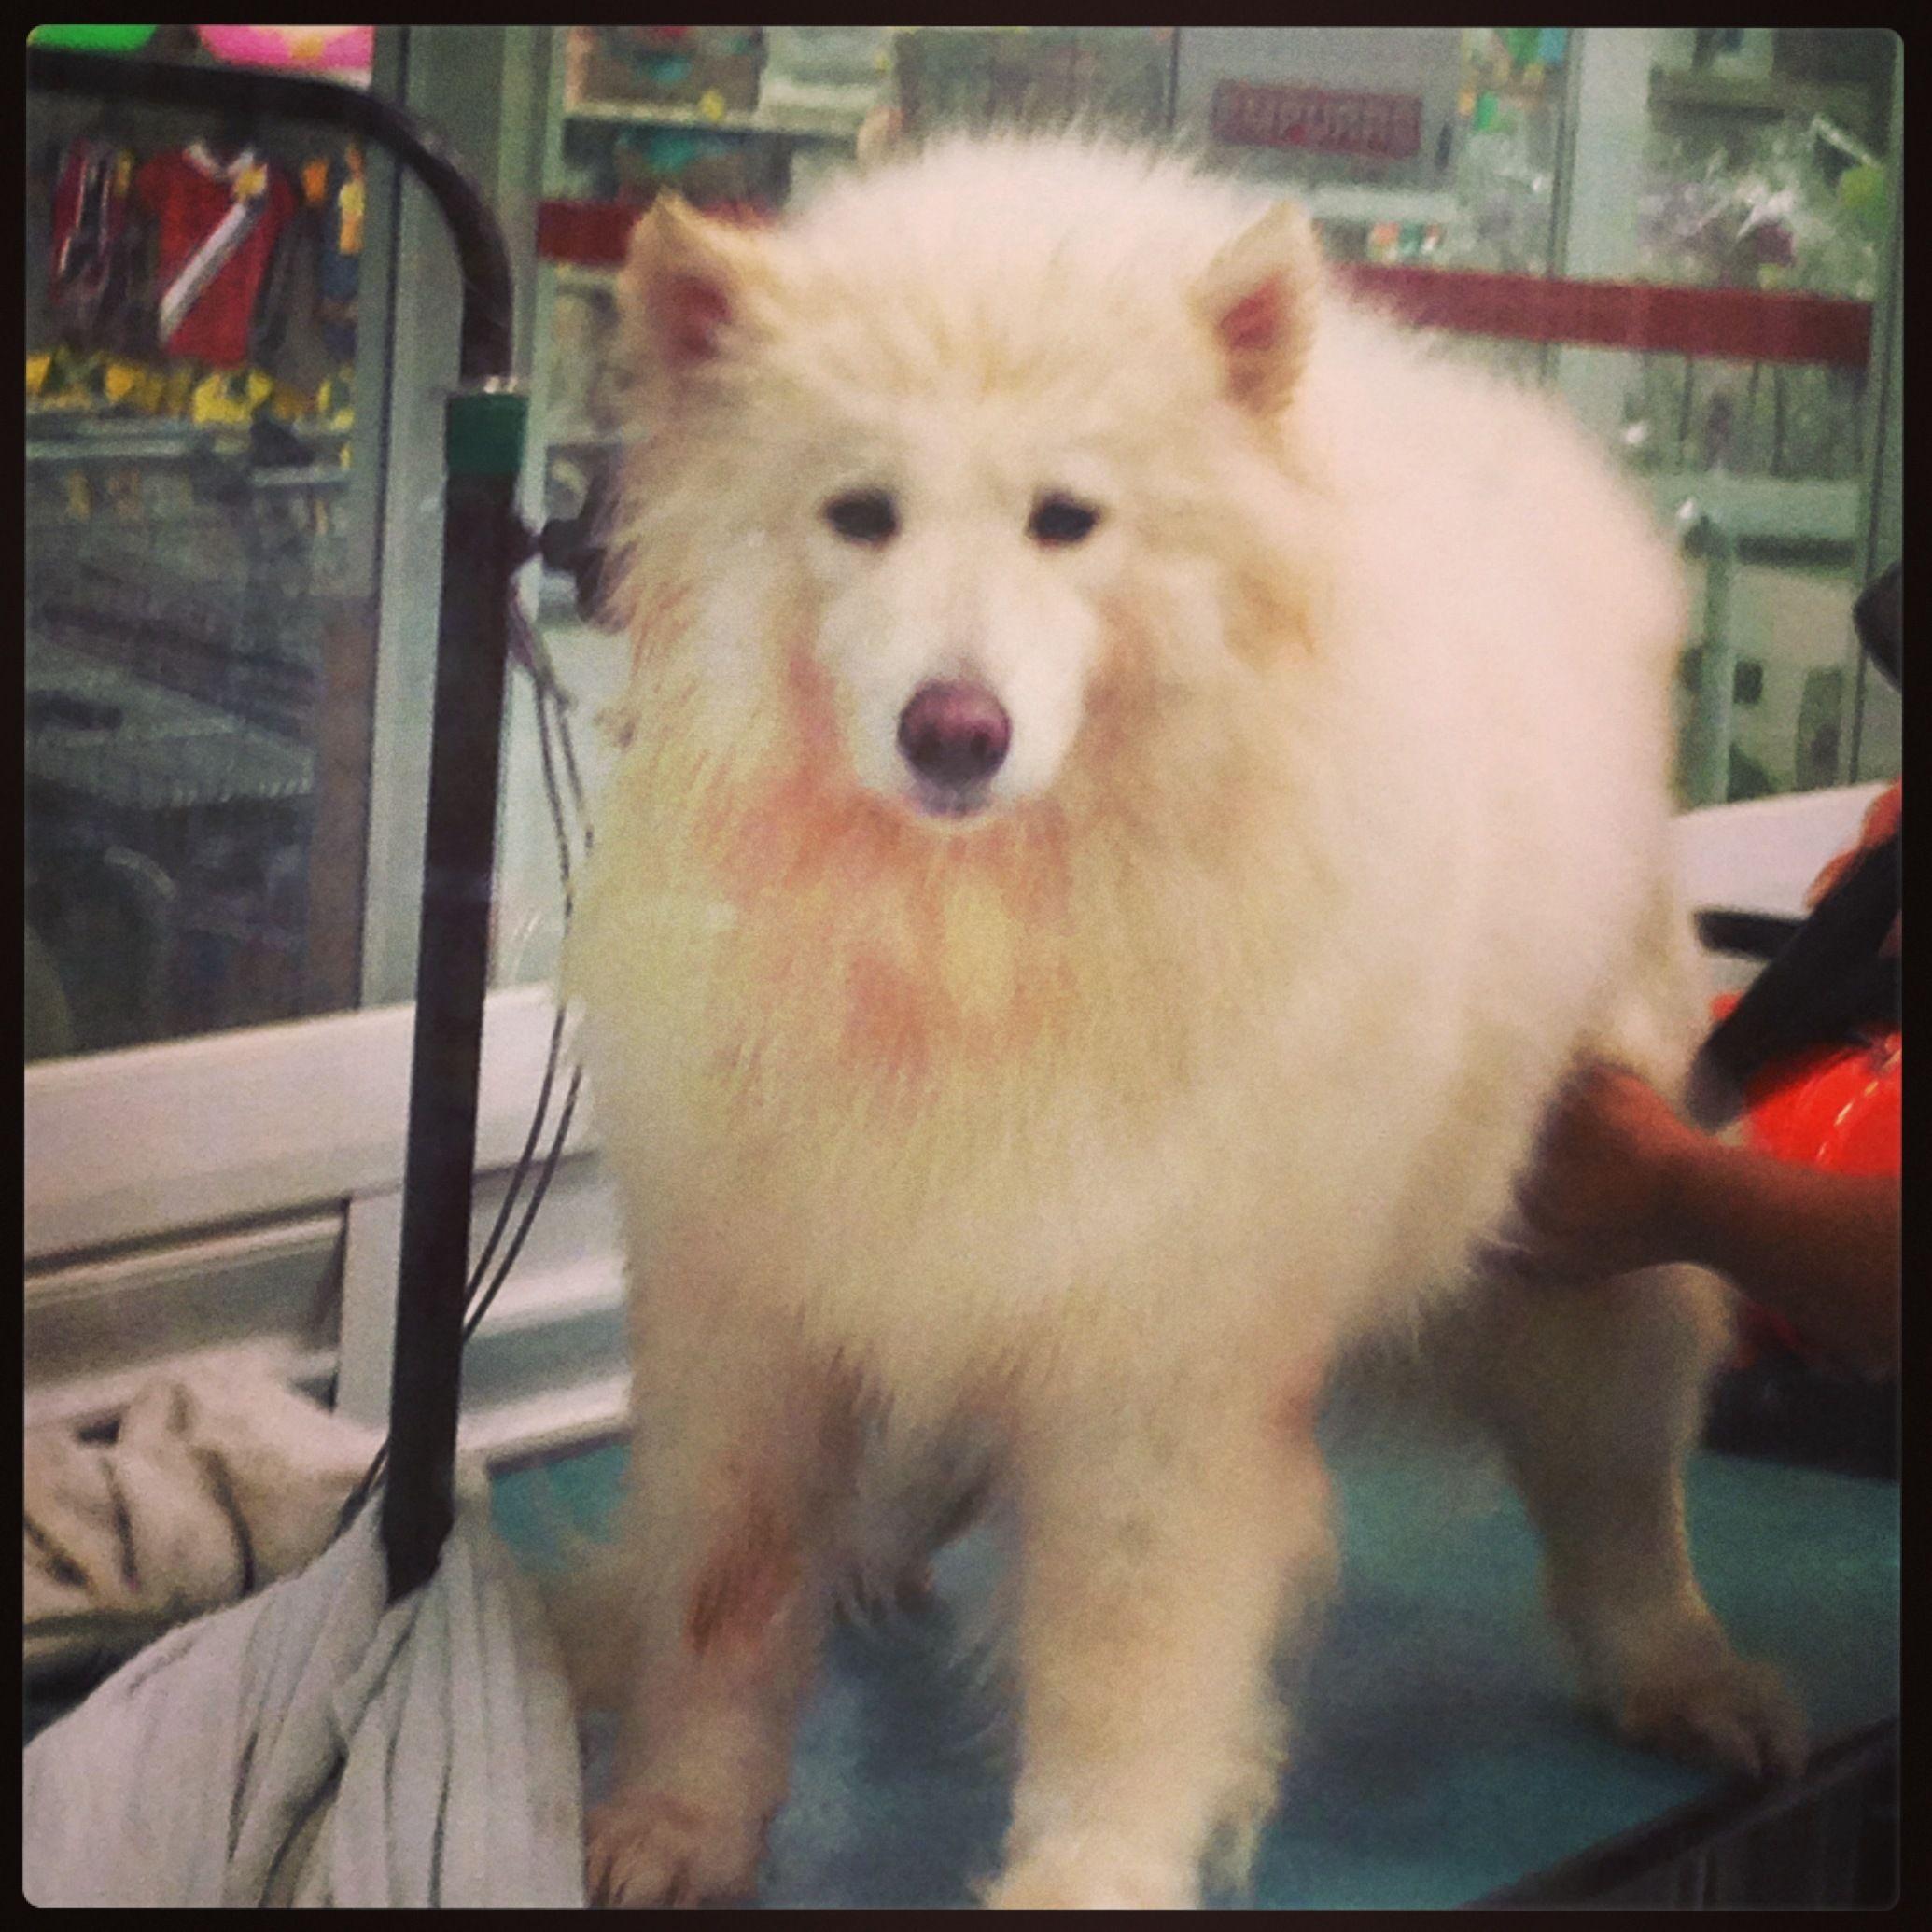 Embelezamento canino - #yuki  #yukituristainsolita  #dog  #scottishterrier #wheatscottie  #cachorro  #cachorroetudodebom  #catioro  #terrierescoces #viagemcompets  #viagemcomcachorro  #cachorroétudodebom #dogsofinstagram #doglover #dogs_of_instagram #instadog #dogsgram #pet #pets #petsofinstagram #pets_of_instagram #petsgram #instapuppy #cute #instacute #instapet #puppylove #puppygram